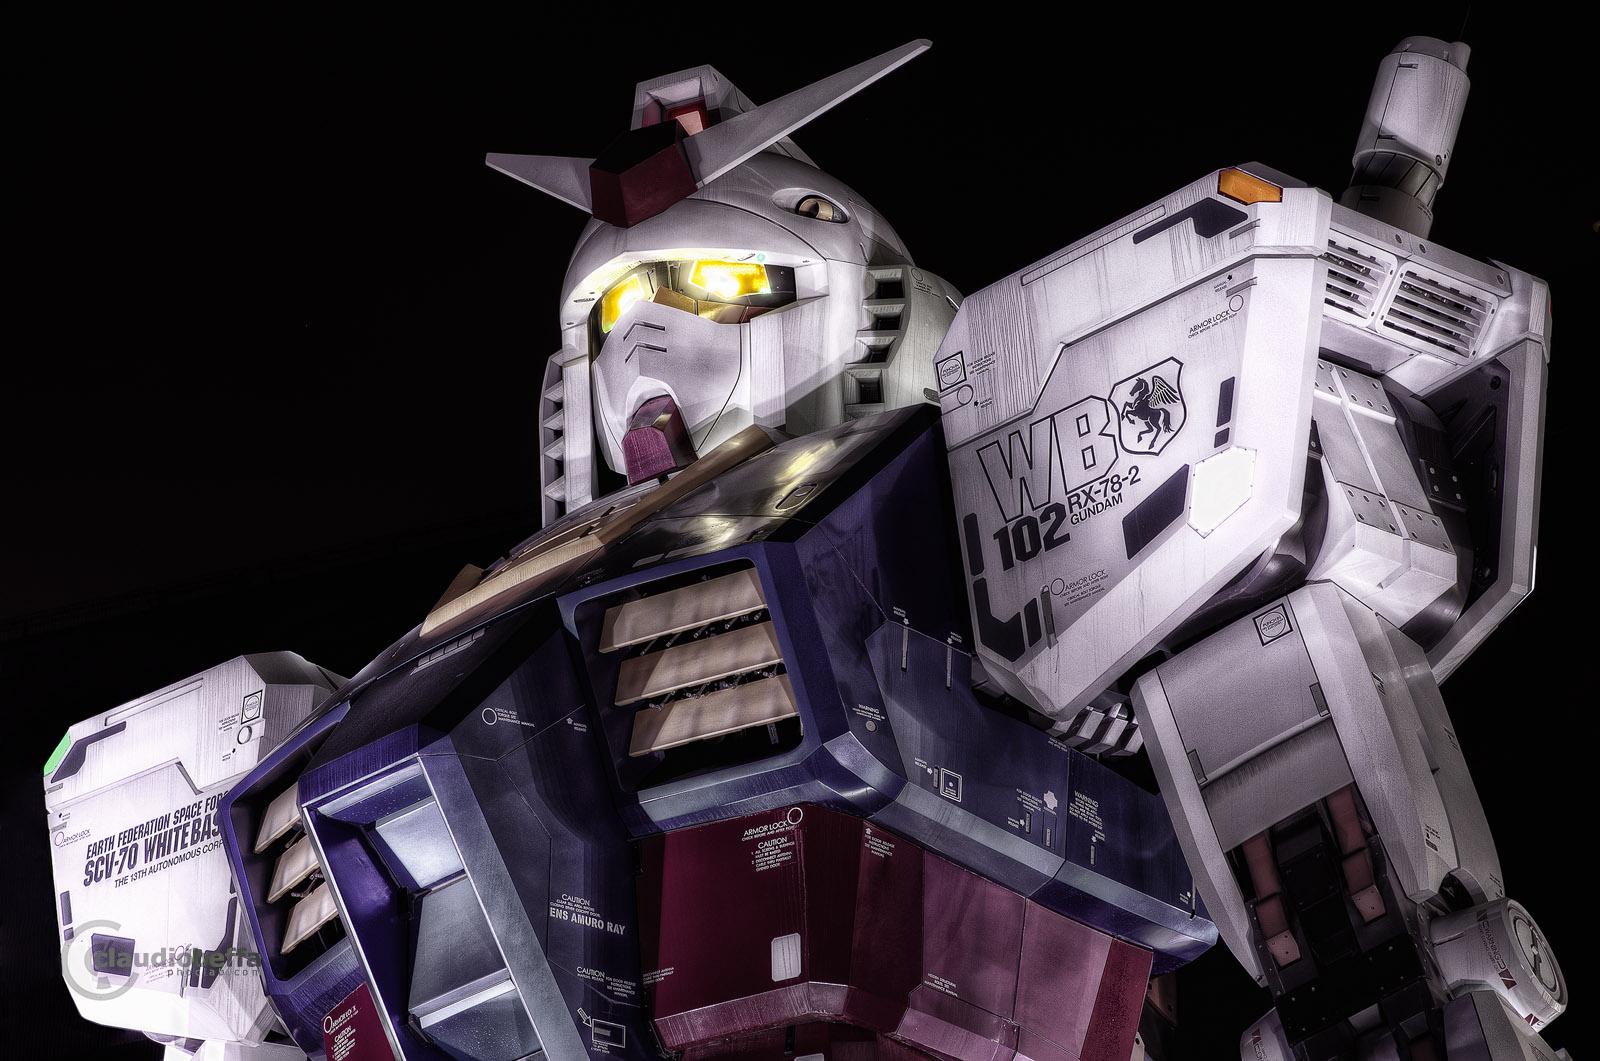 RX-78-2 Gundam Full Scale Statue Odaiba Tokyo Japan